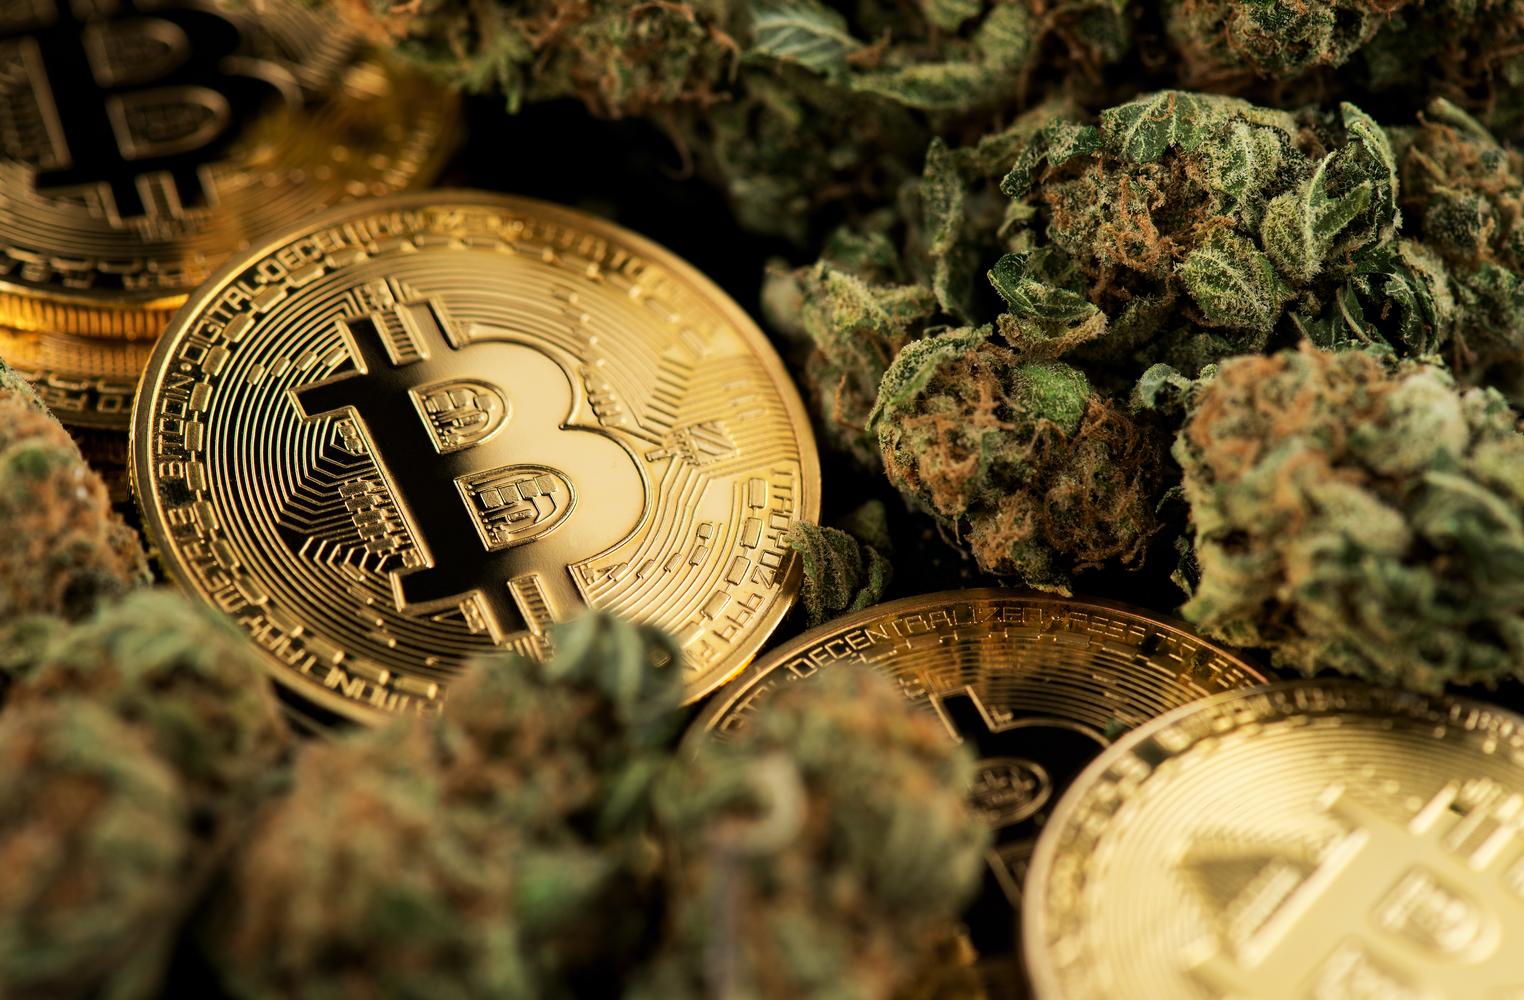 Acheter du cannabis avec des Bitcoins